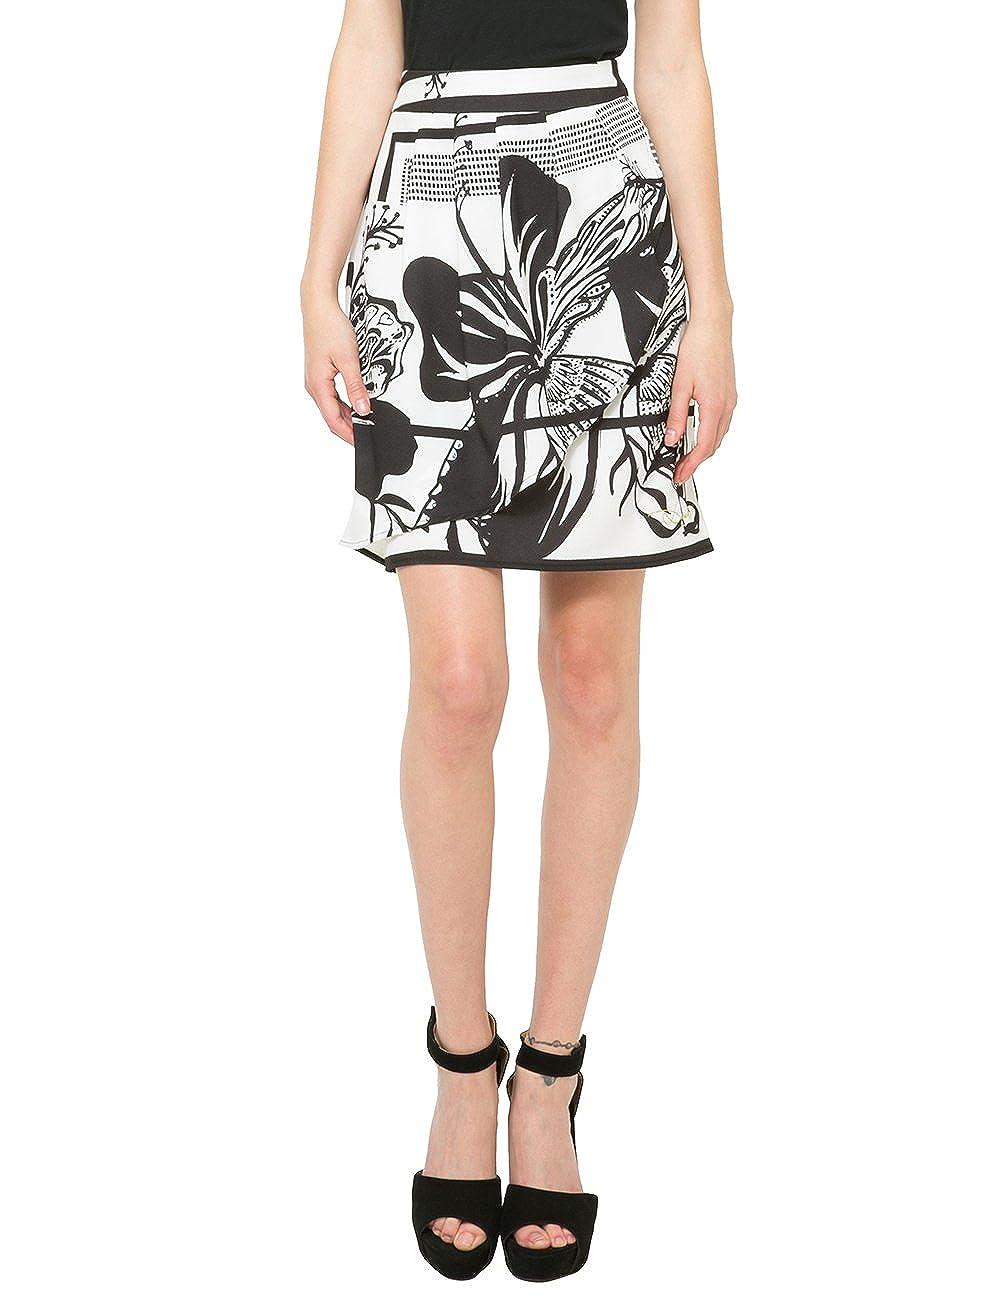 Desigual Fal_Mini, Falda para Mujer, Blanco (Tiza) 38: Amazon.es ...